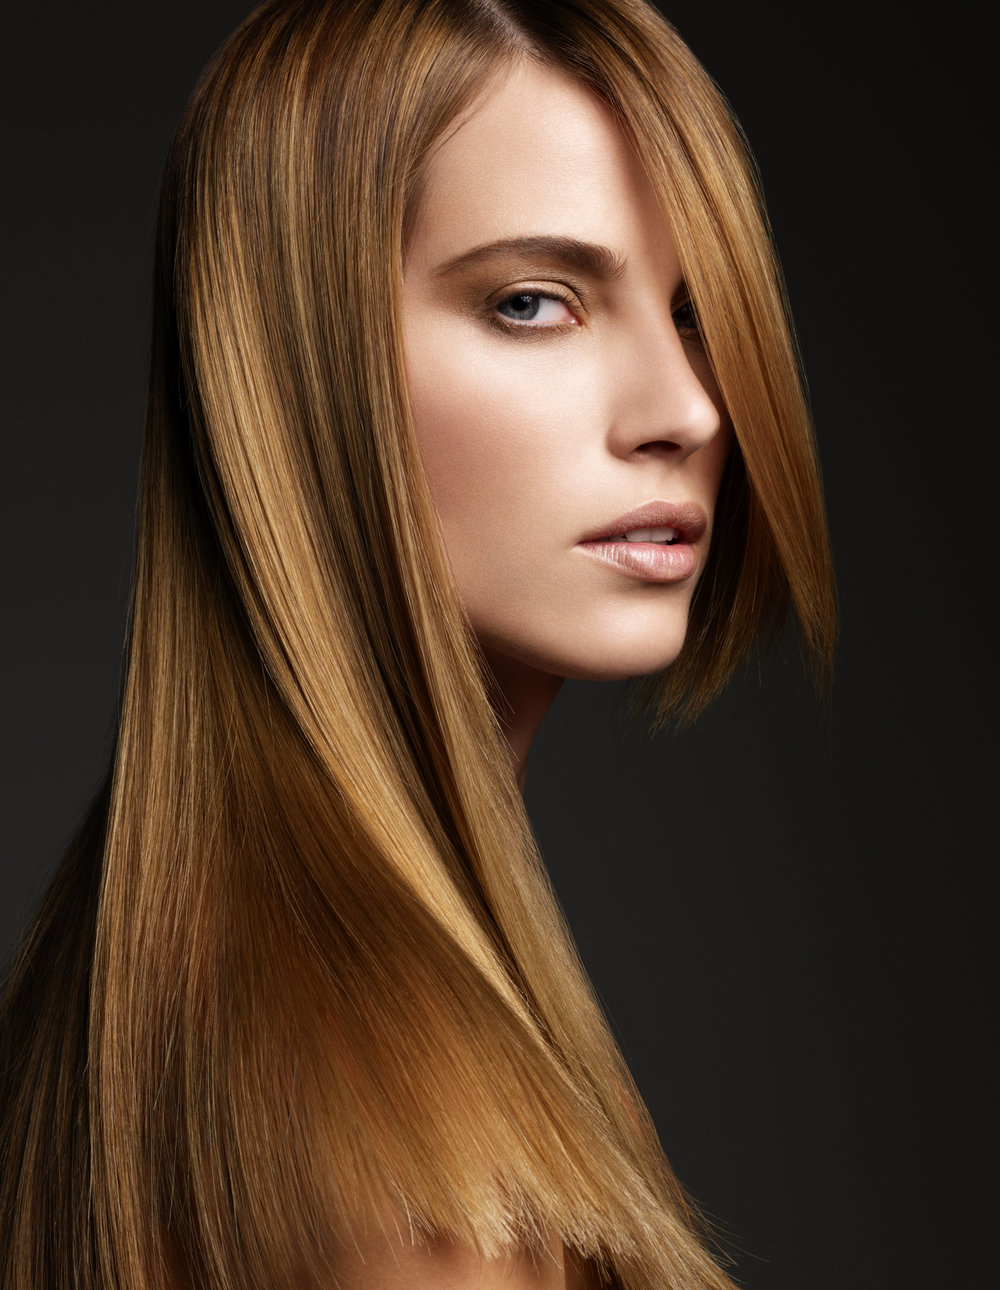 long hair poster shot.jpg